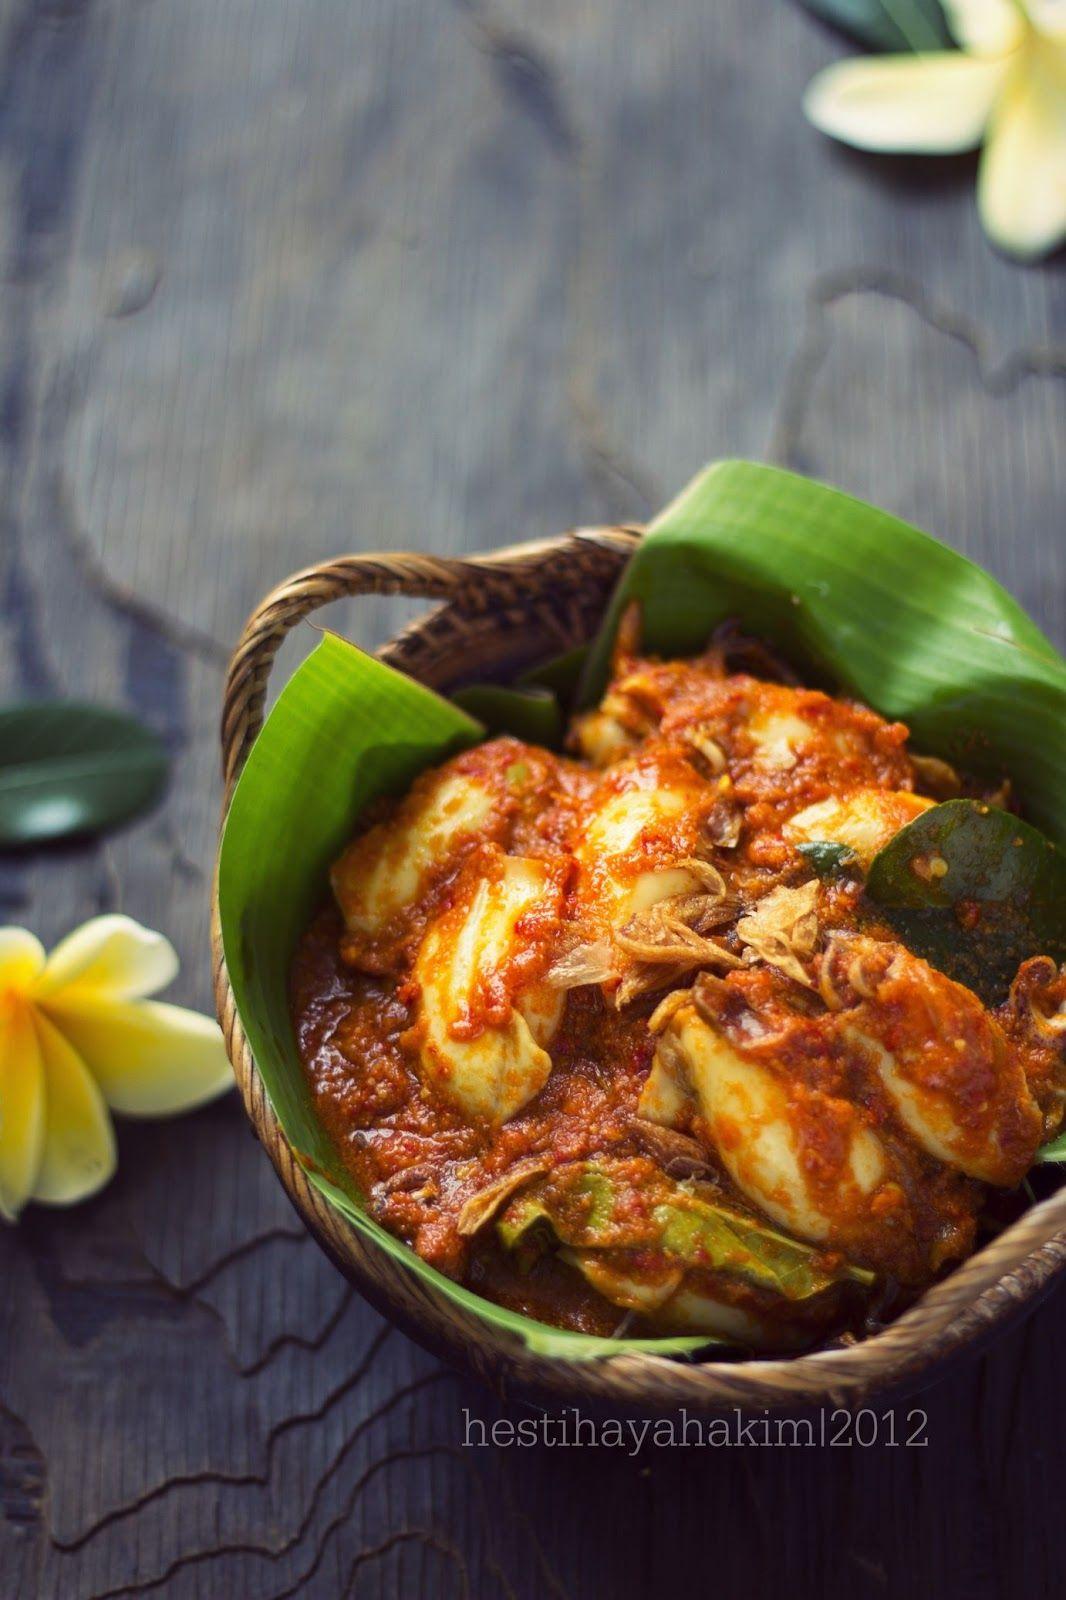 Hesti S Kitchen Yummy For Your Tummy Kenus Mebase Bali Resep Seafood Resep Masakan Indonesia Makanan